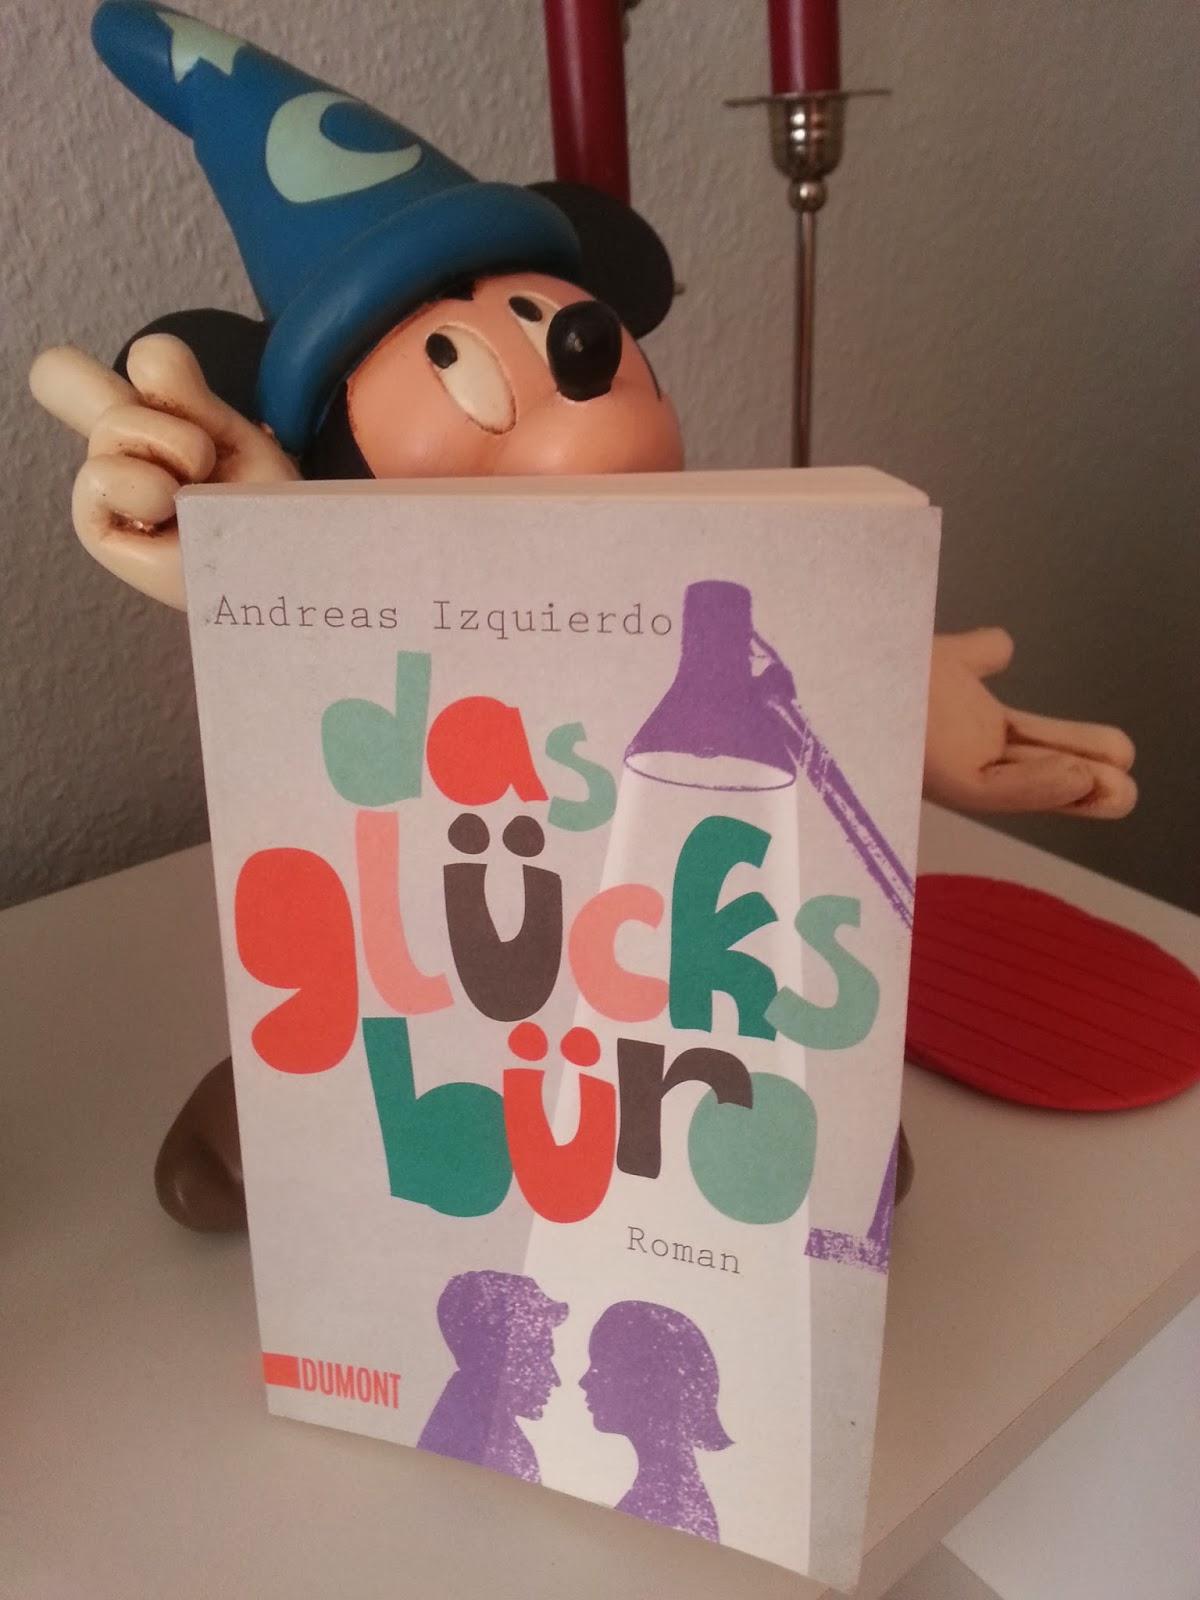 http://claudiasbuchstabenhimmel.blogspot.de/2014/02/das-glucksburo-von-andreas-izquierdo.html